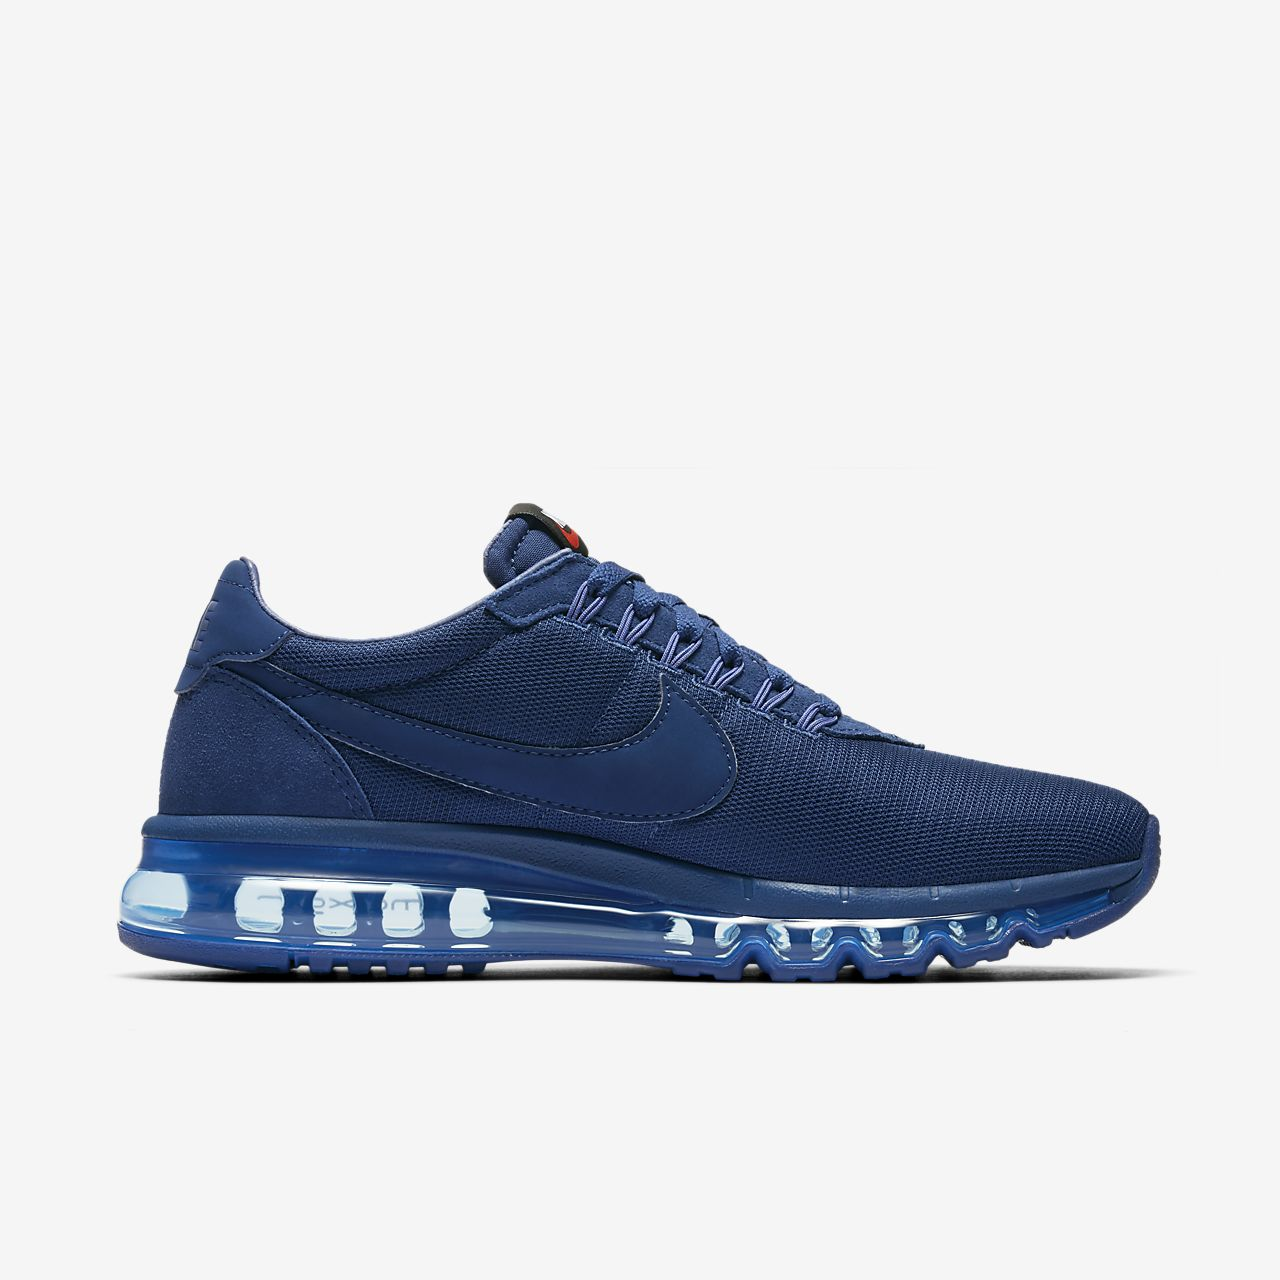 Chaussure mixte Nike Air Max LD Zero